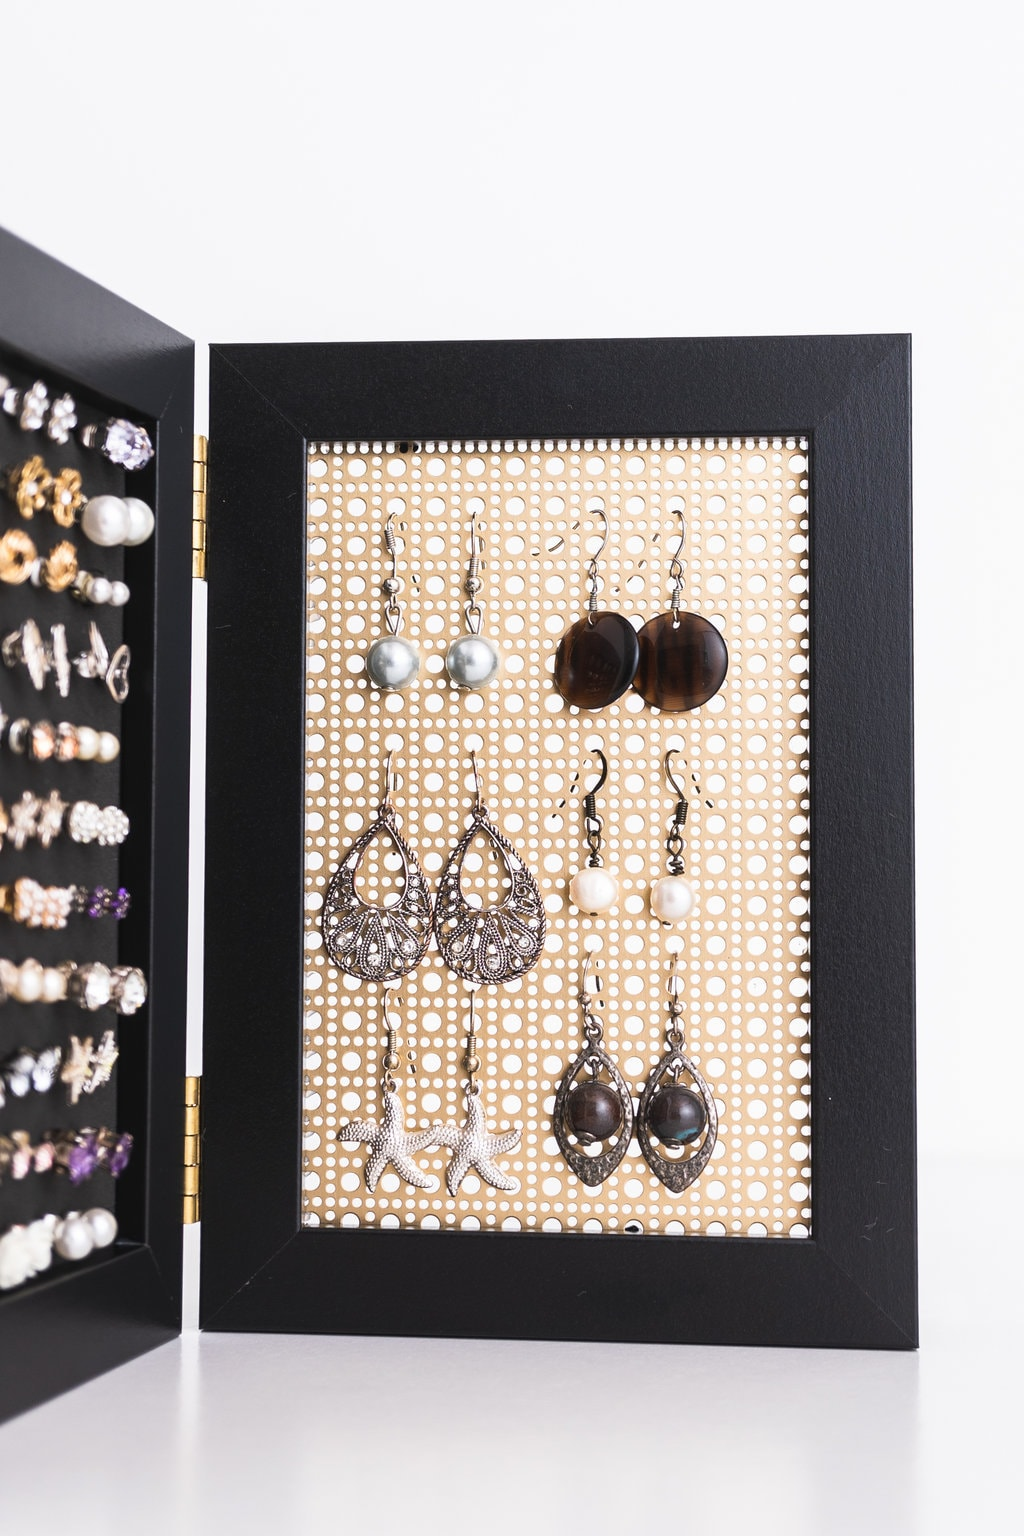 4x6 Framed Earring Organizer - Gold Metal Screen - Black Frames ...